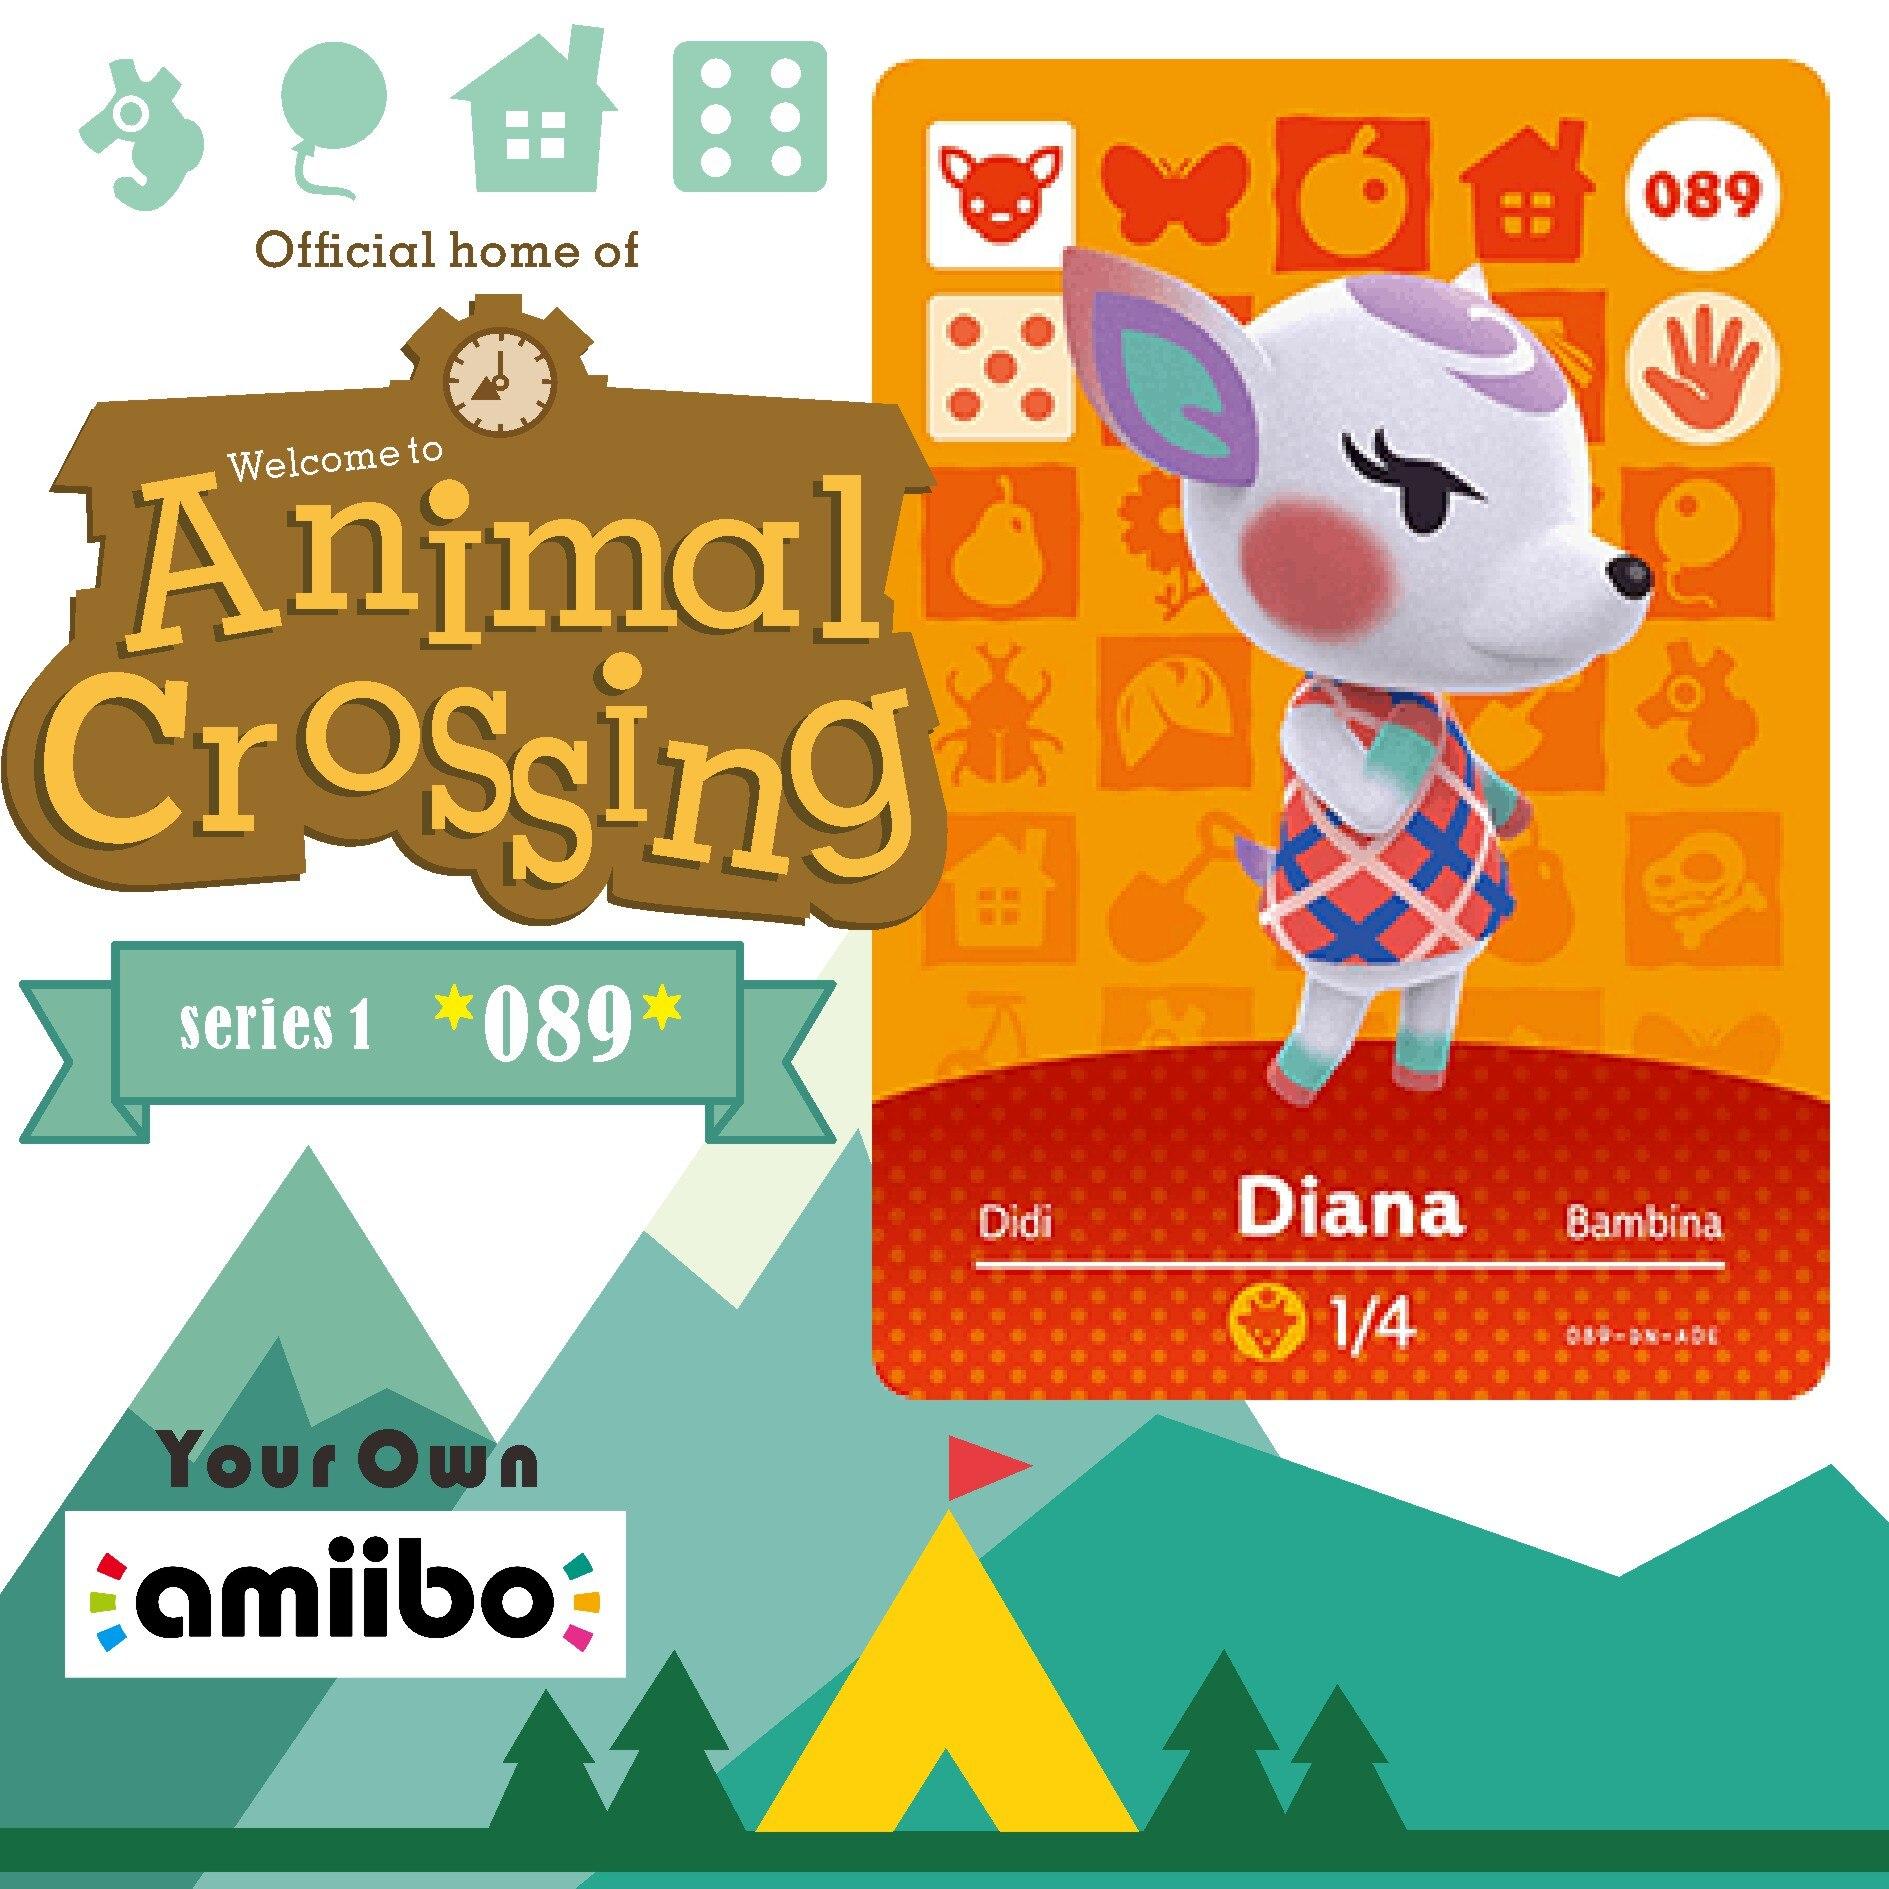 089 Amiibo Animal Crossing Diana Animal Crossing Amiibo Diana Amiibo Animal Crossing Diana Animal Crossing Amiibo Diana For NS